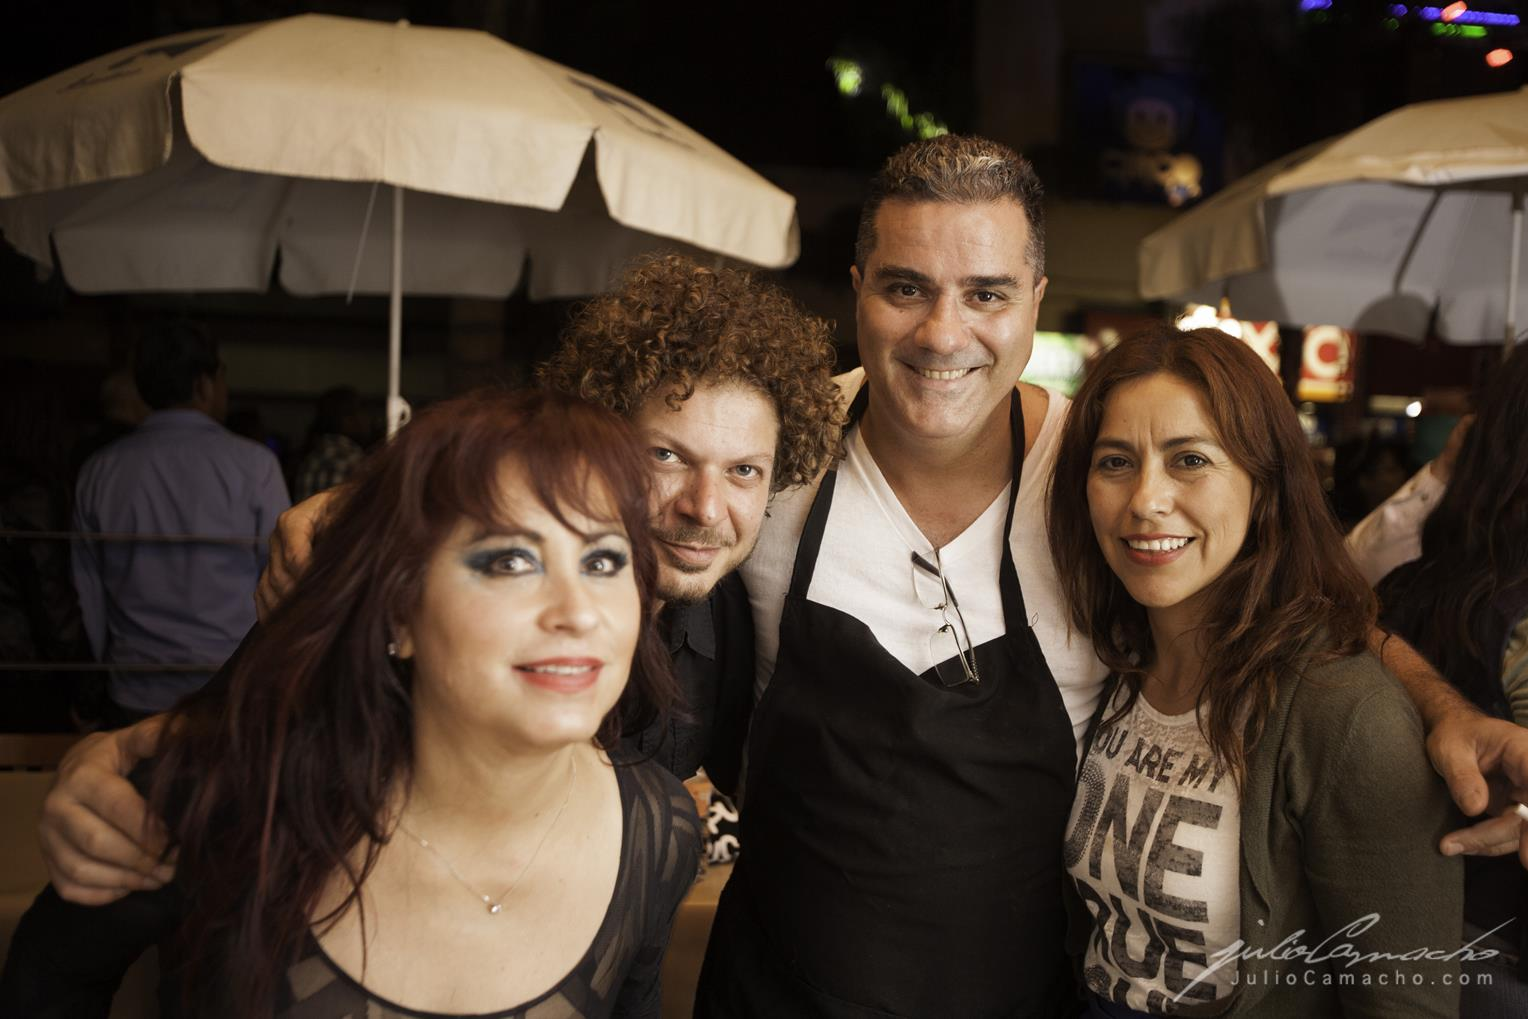 2014-10-30 31 CAST TOUR Ensenada y Tijuana - 1845 - www.Juli (Copy).jpg